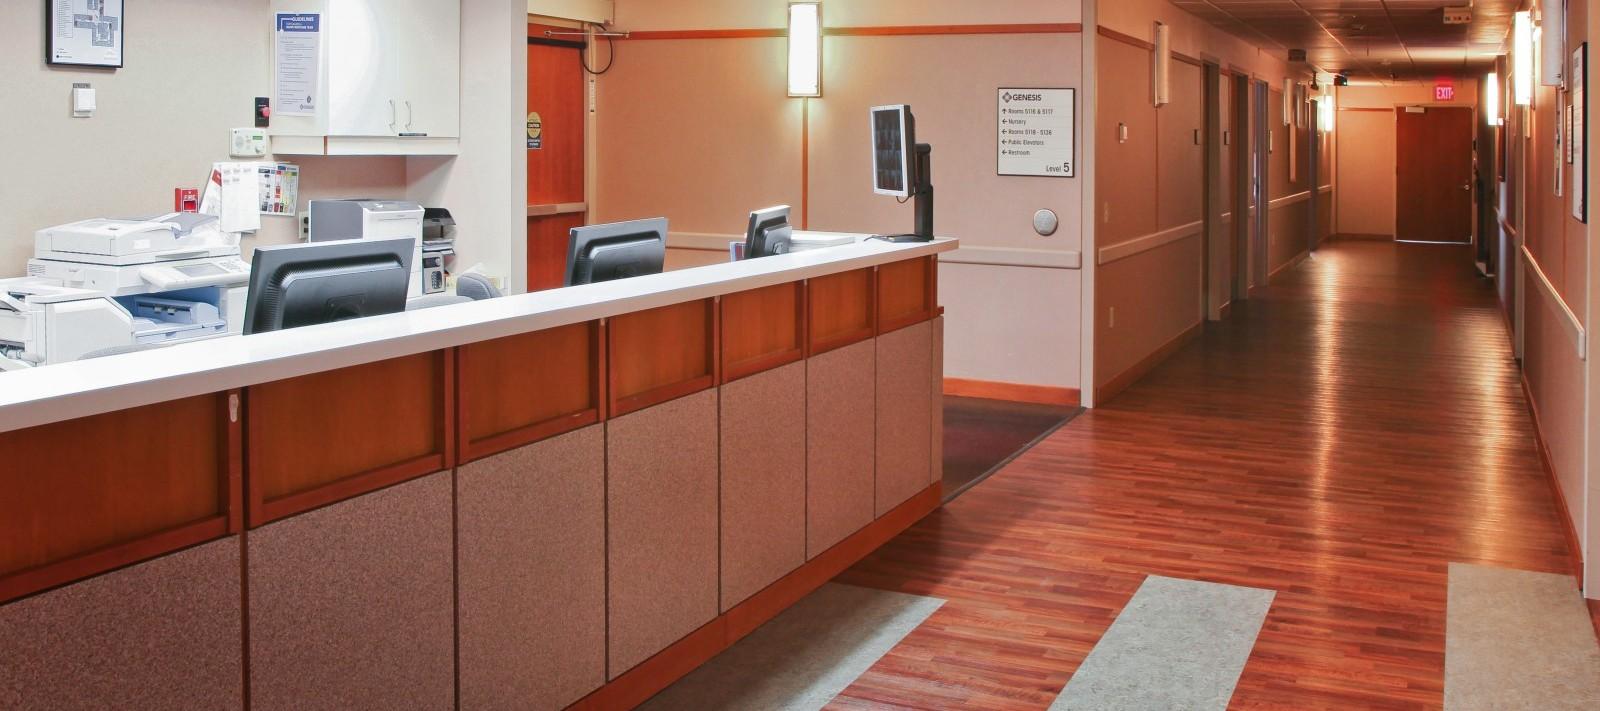 Genesis Birth Center nurse's station